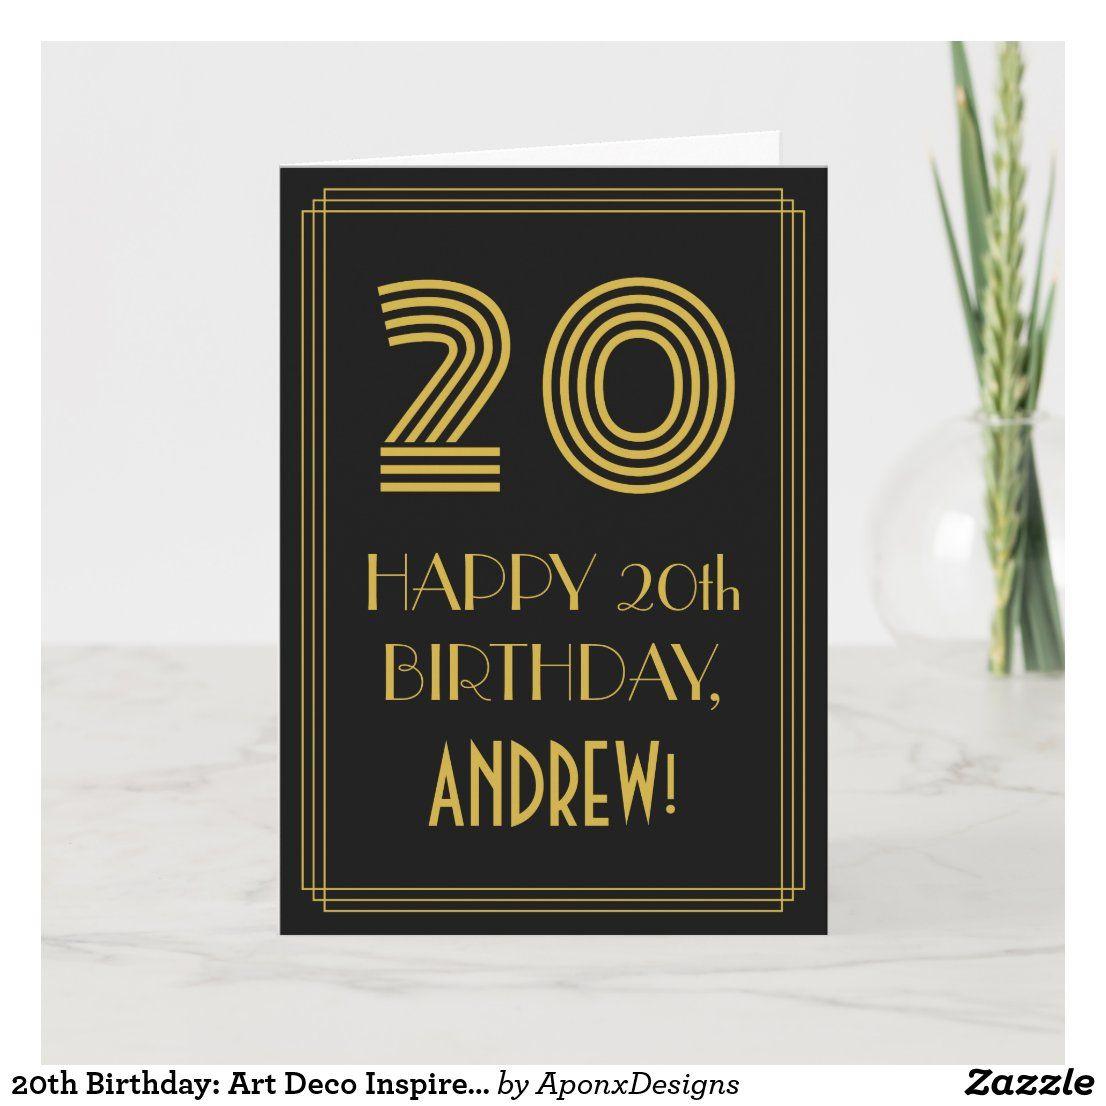 20th Birthday Art Deco Inspired Look 20 Name Card Zazzle Com In 2021 Art Deco Inspired Name Cards Happy 20th Birthday